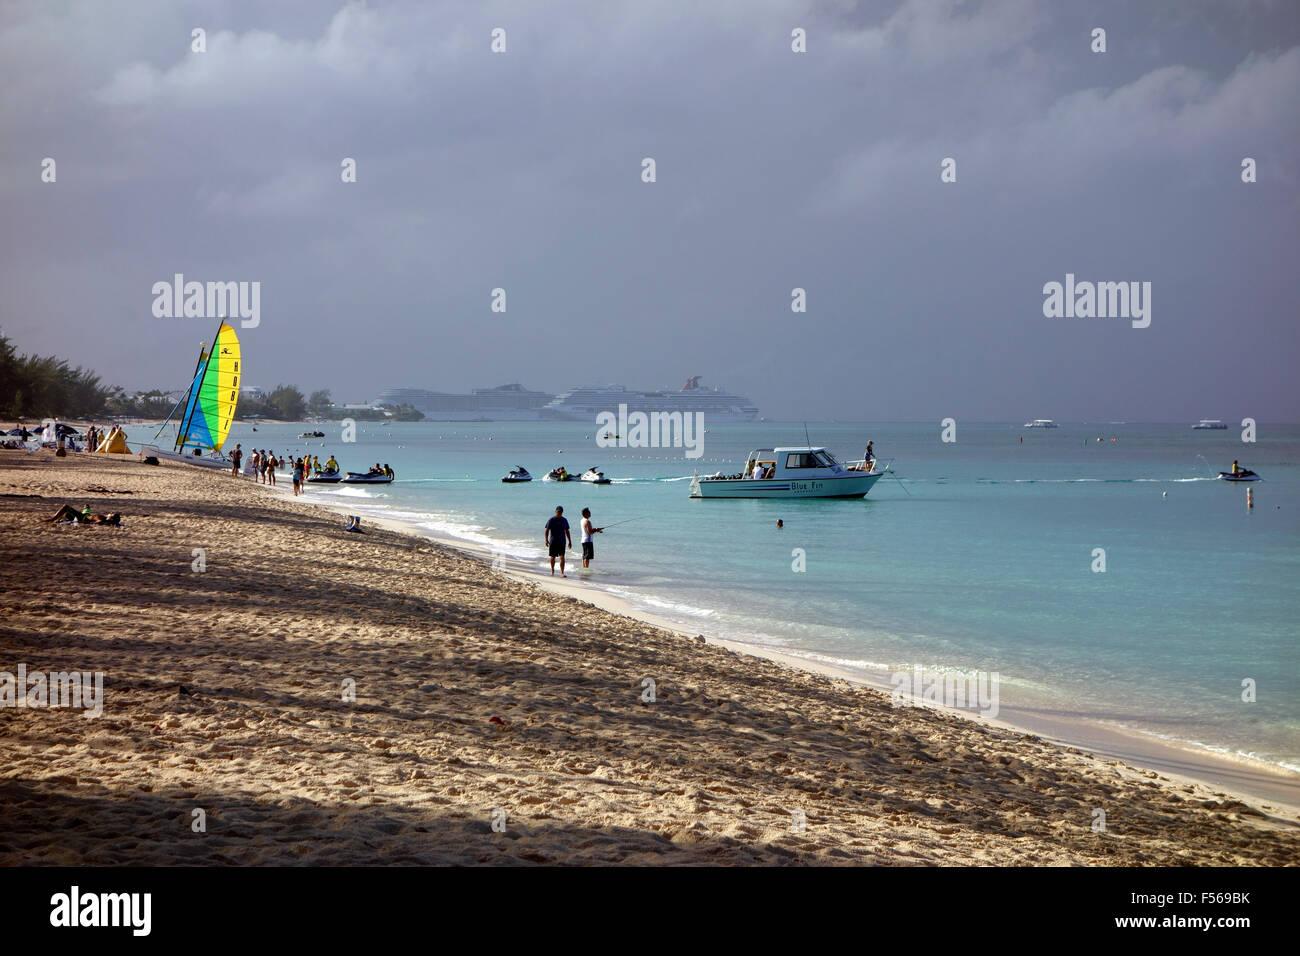 Seven Mile Beach, Grand Cayman, Cayman Islands, Caribbean - Stock Image